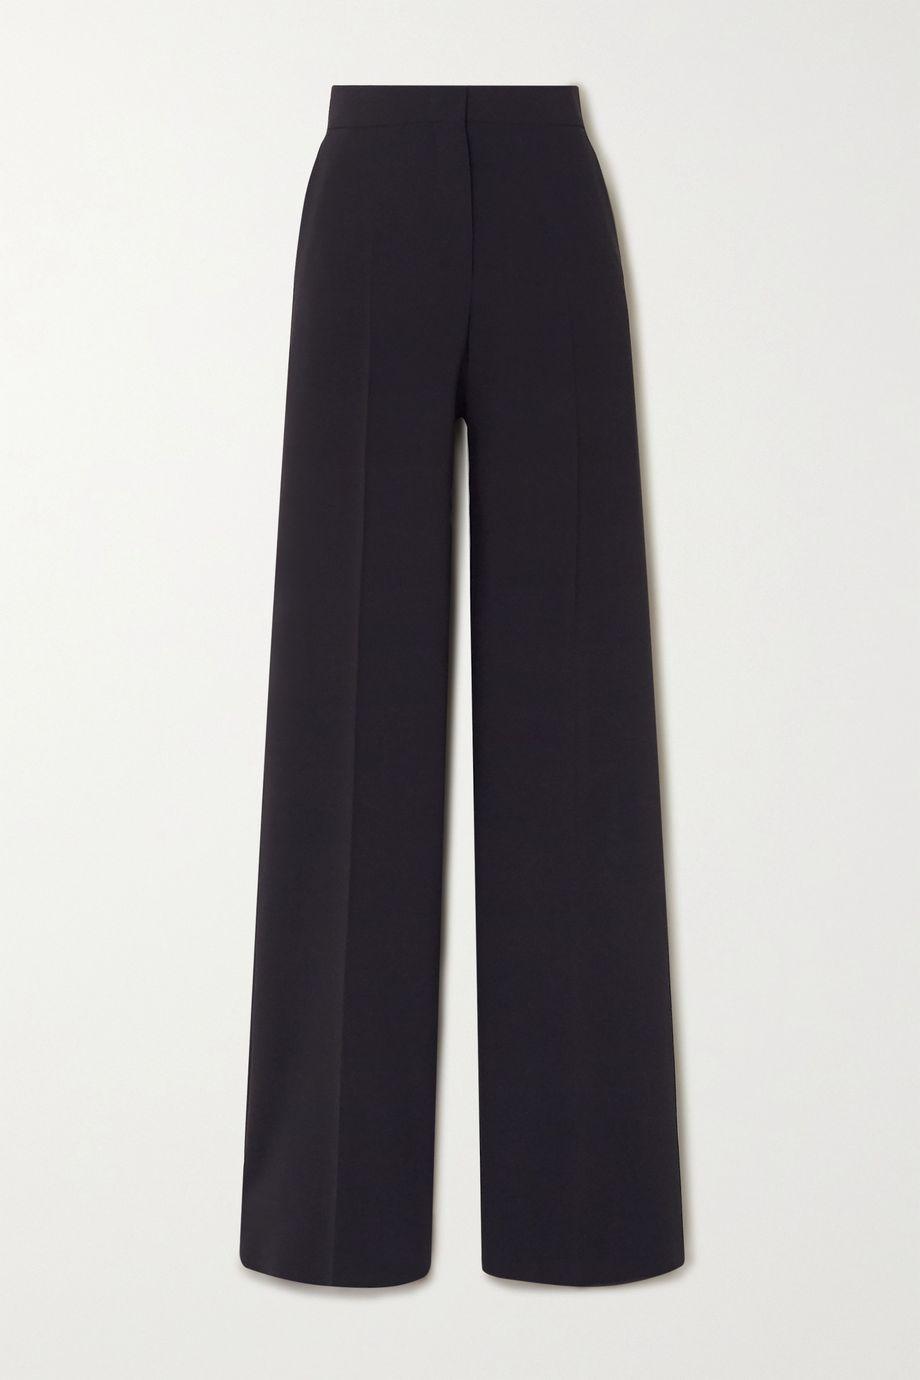 Max Mara Afoso stretch-wool wide-leg pants